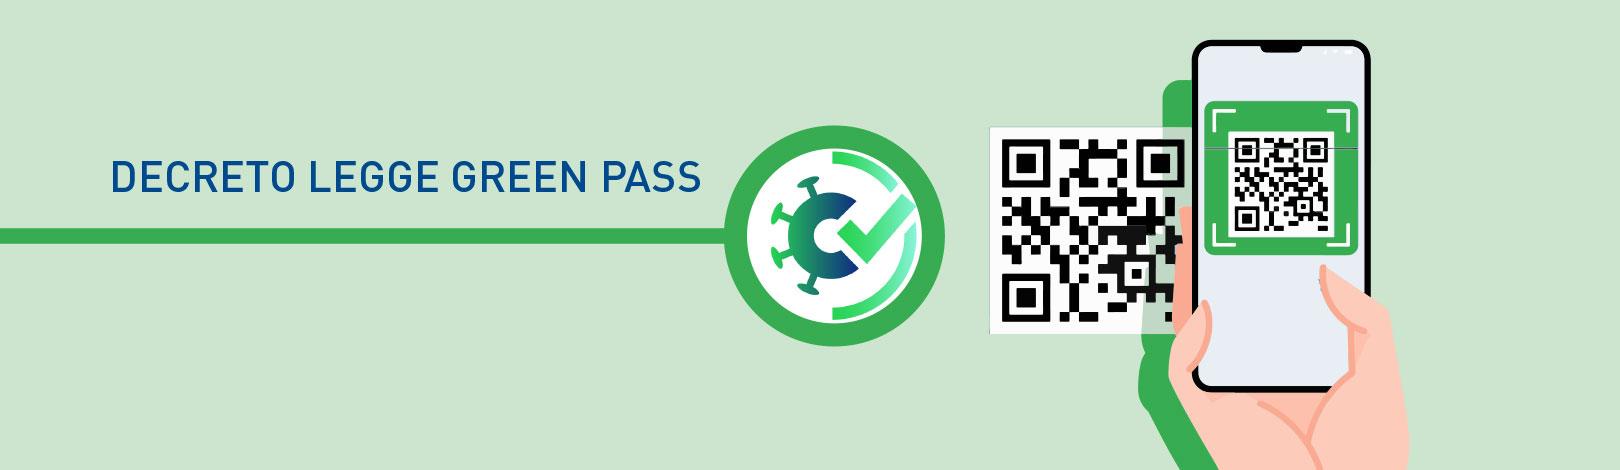 Decreto legge green pass